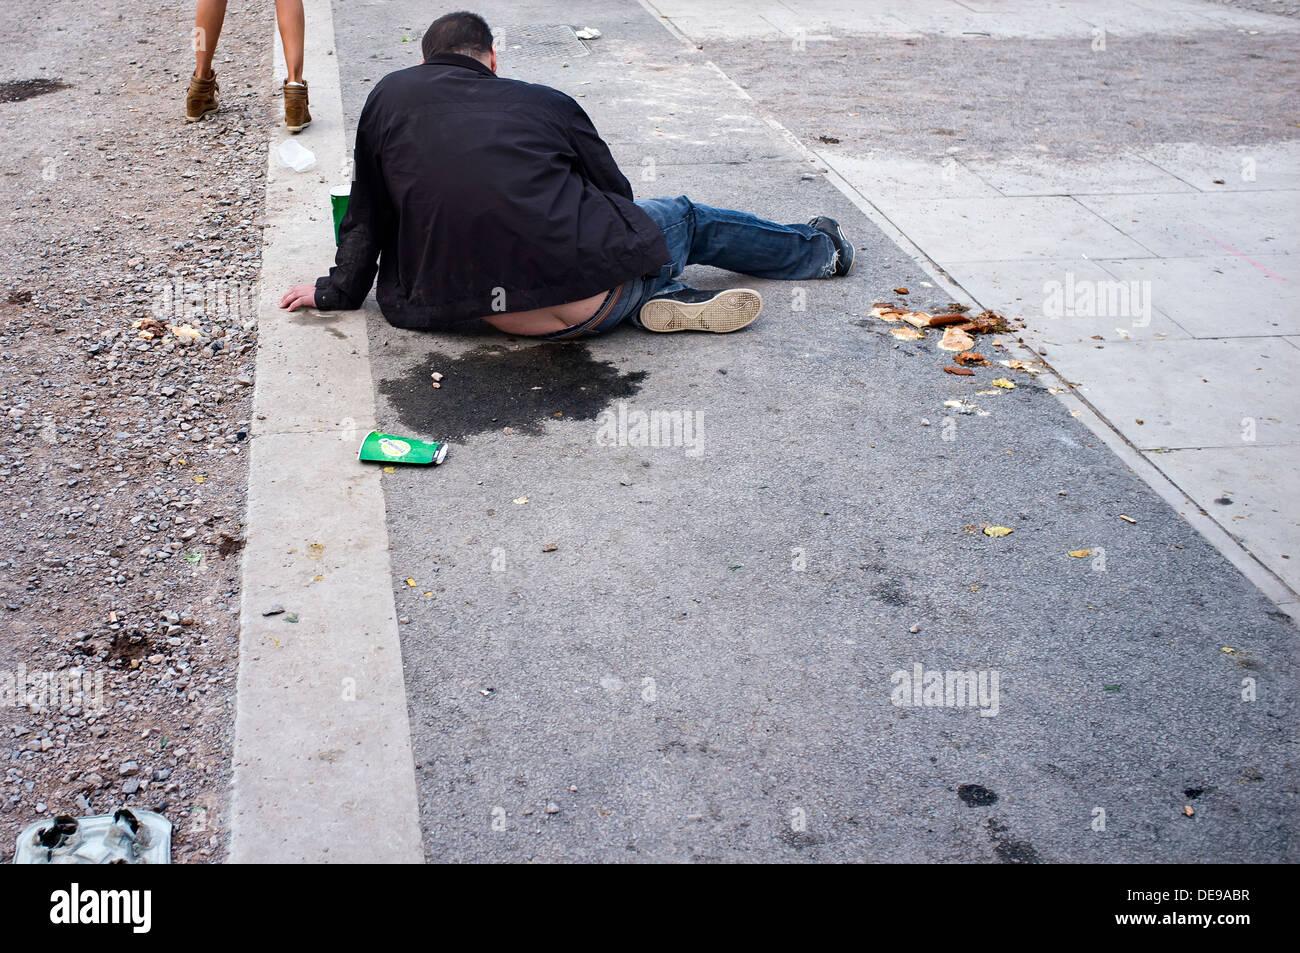 Drunk Man Sitting On Pavement Stock Photo 60442027 Alamy